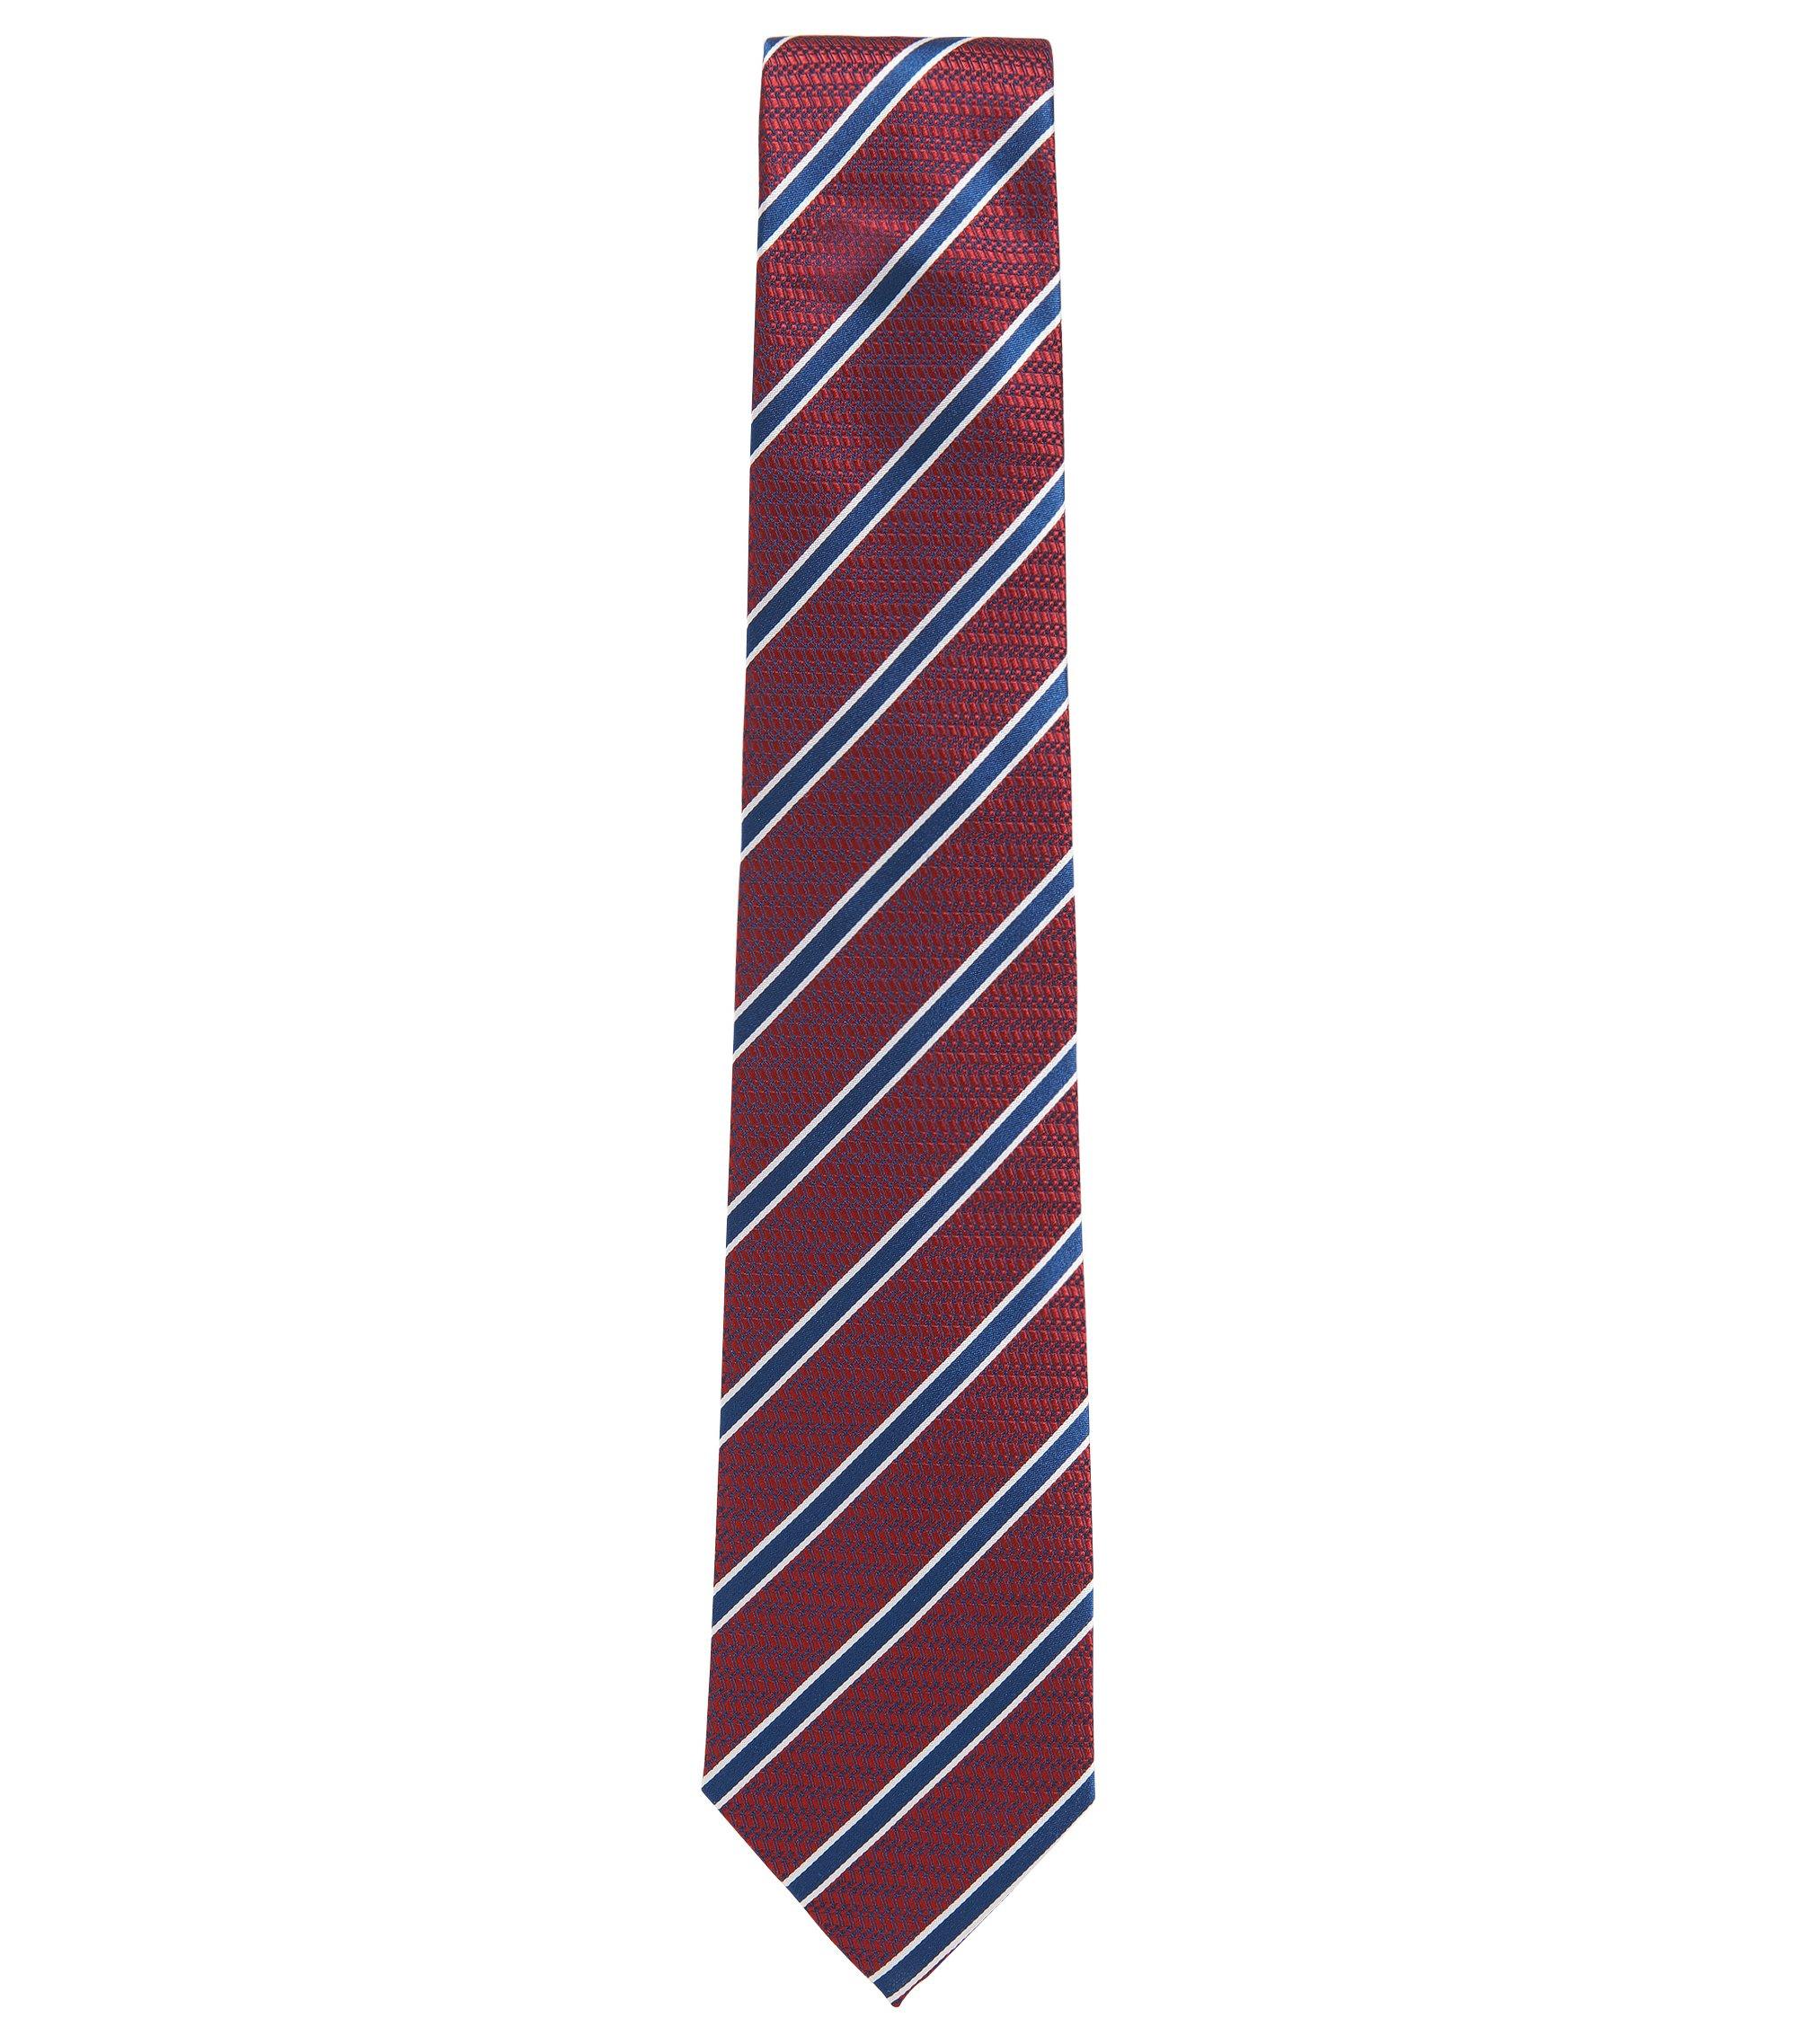 BOSS Tailored Striped Italian Silk Tie, Red